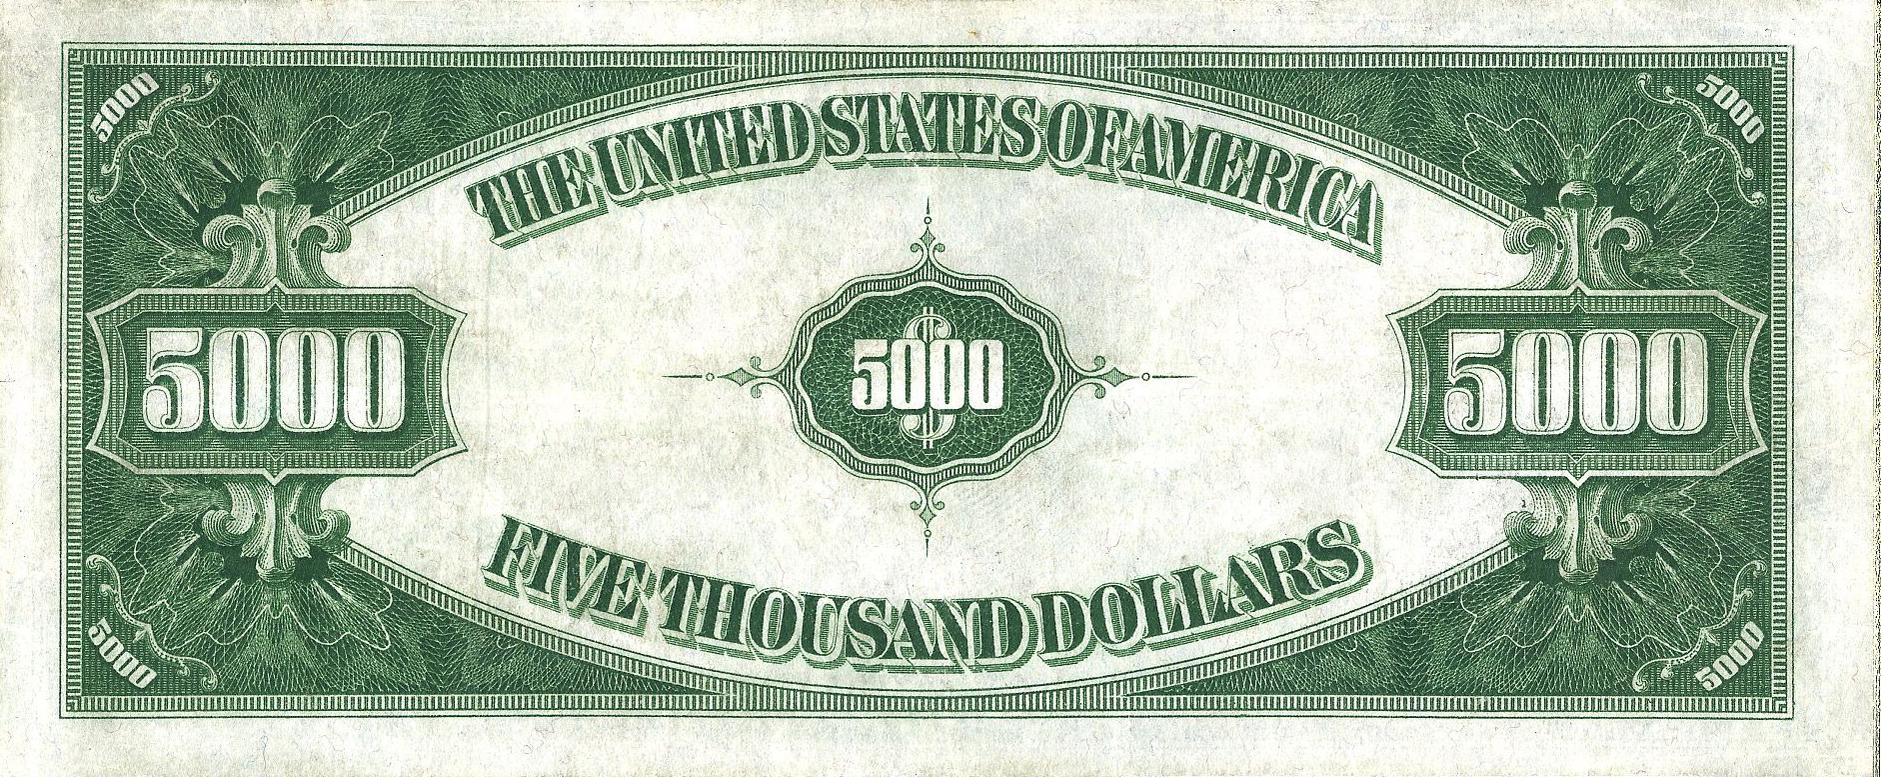 US $5000 1934 Federal Reserve Note Reverse.jpg